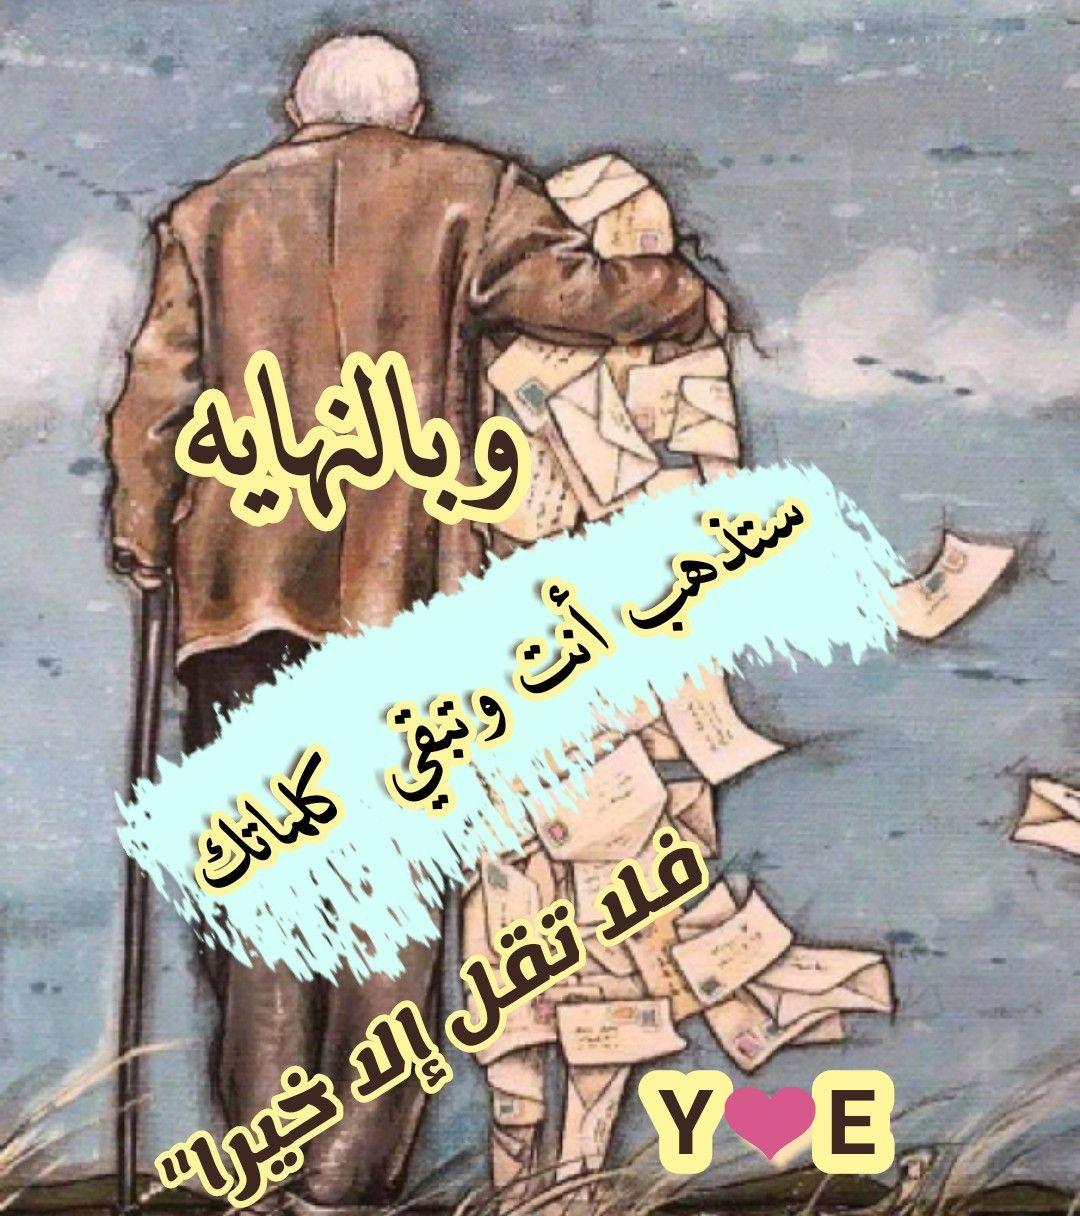 Pin By Youssef Elnifili On حكم تهز القلوب Novelty Sign Home Decor Decor